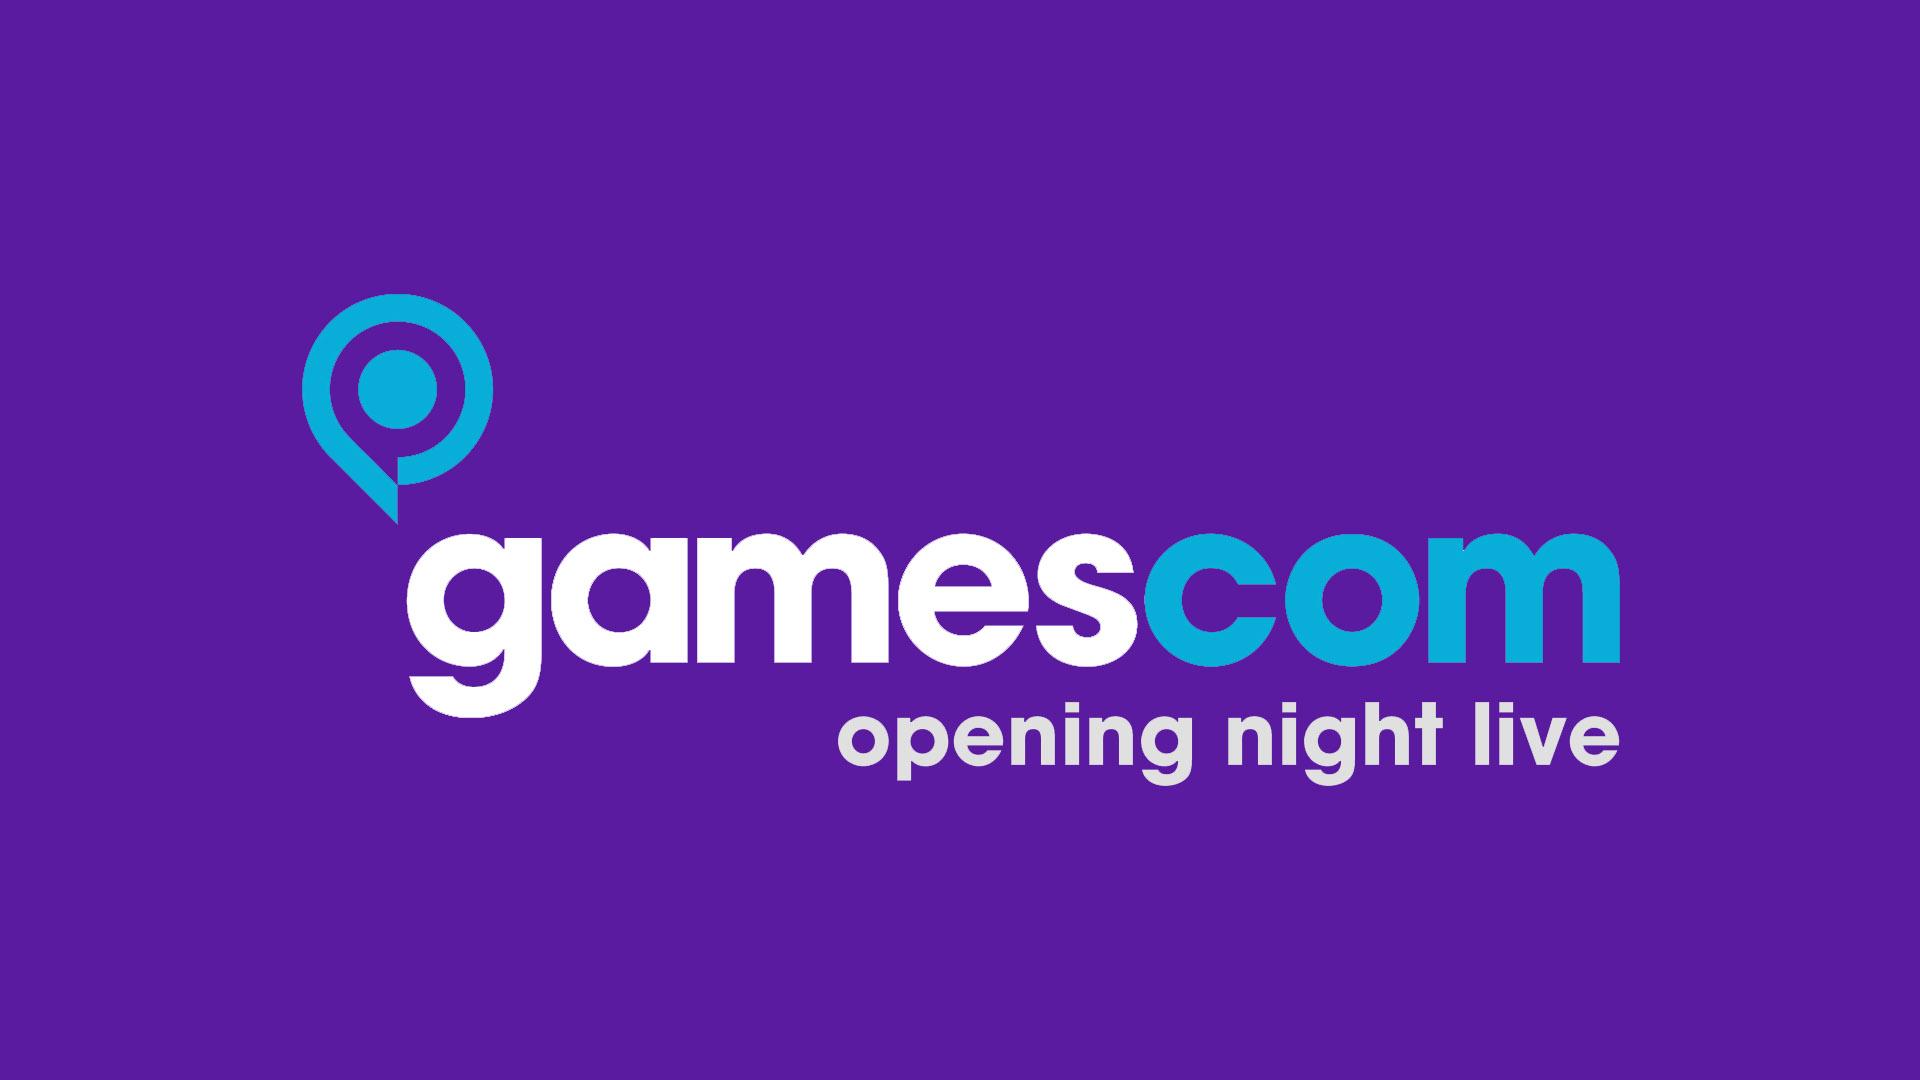 gamescom openig night live